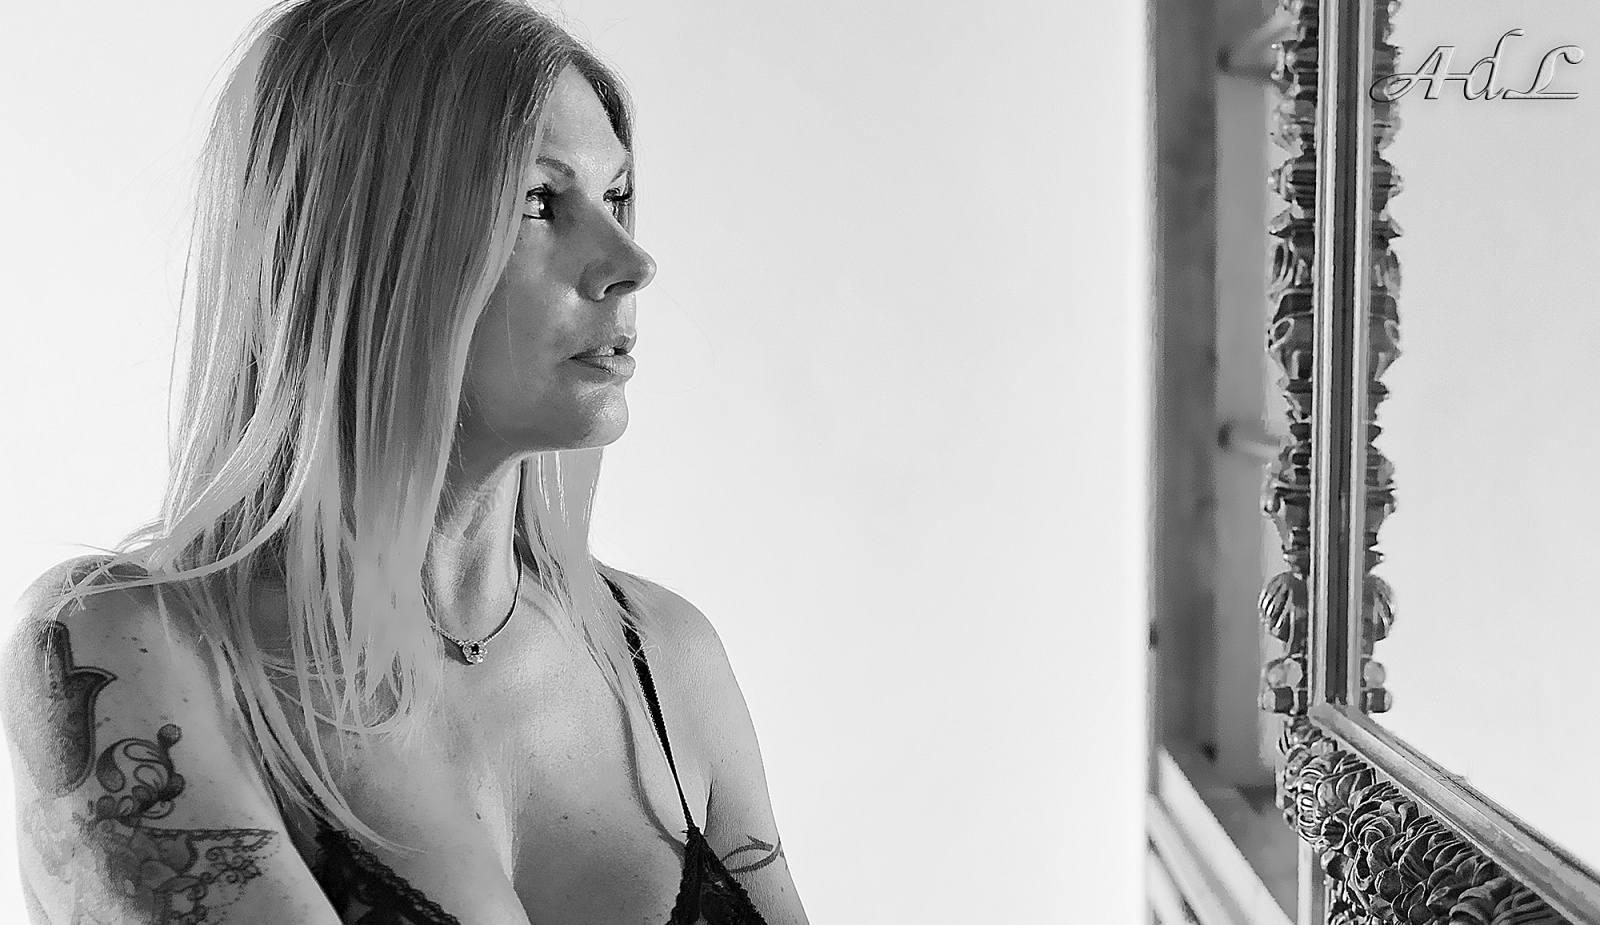 2018 - Carla